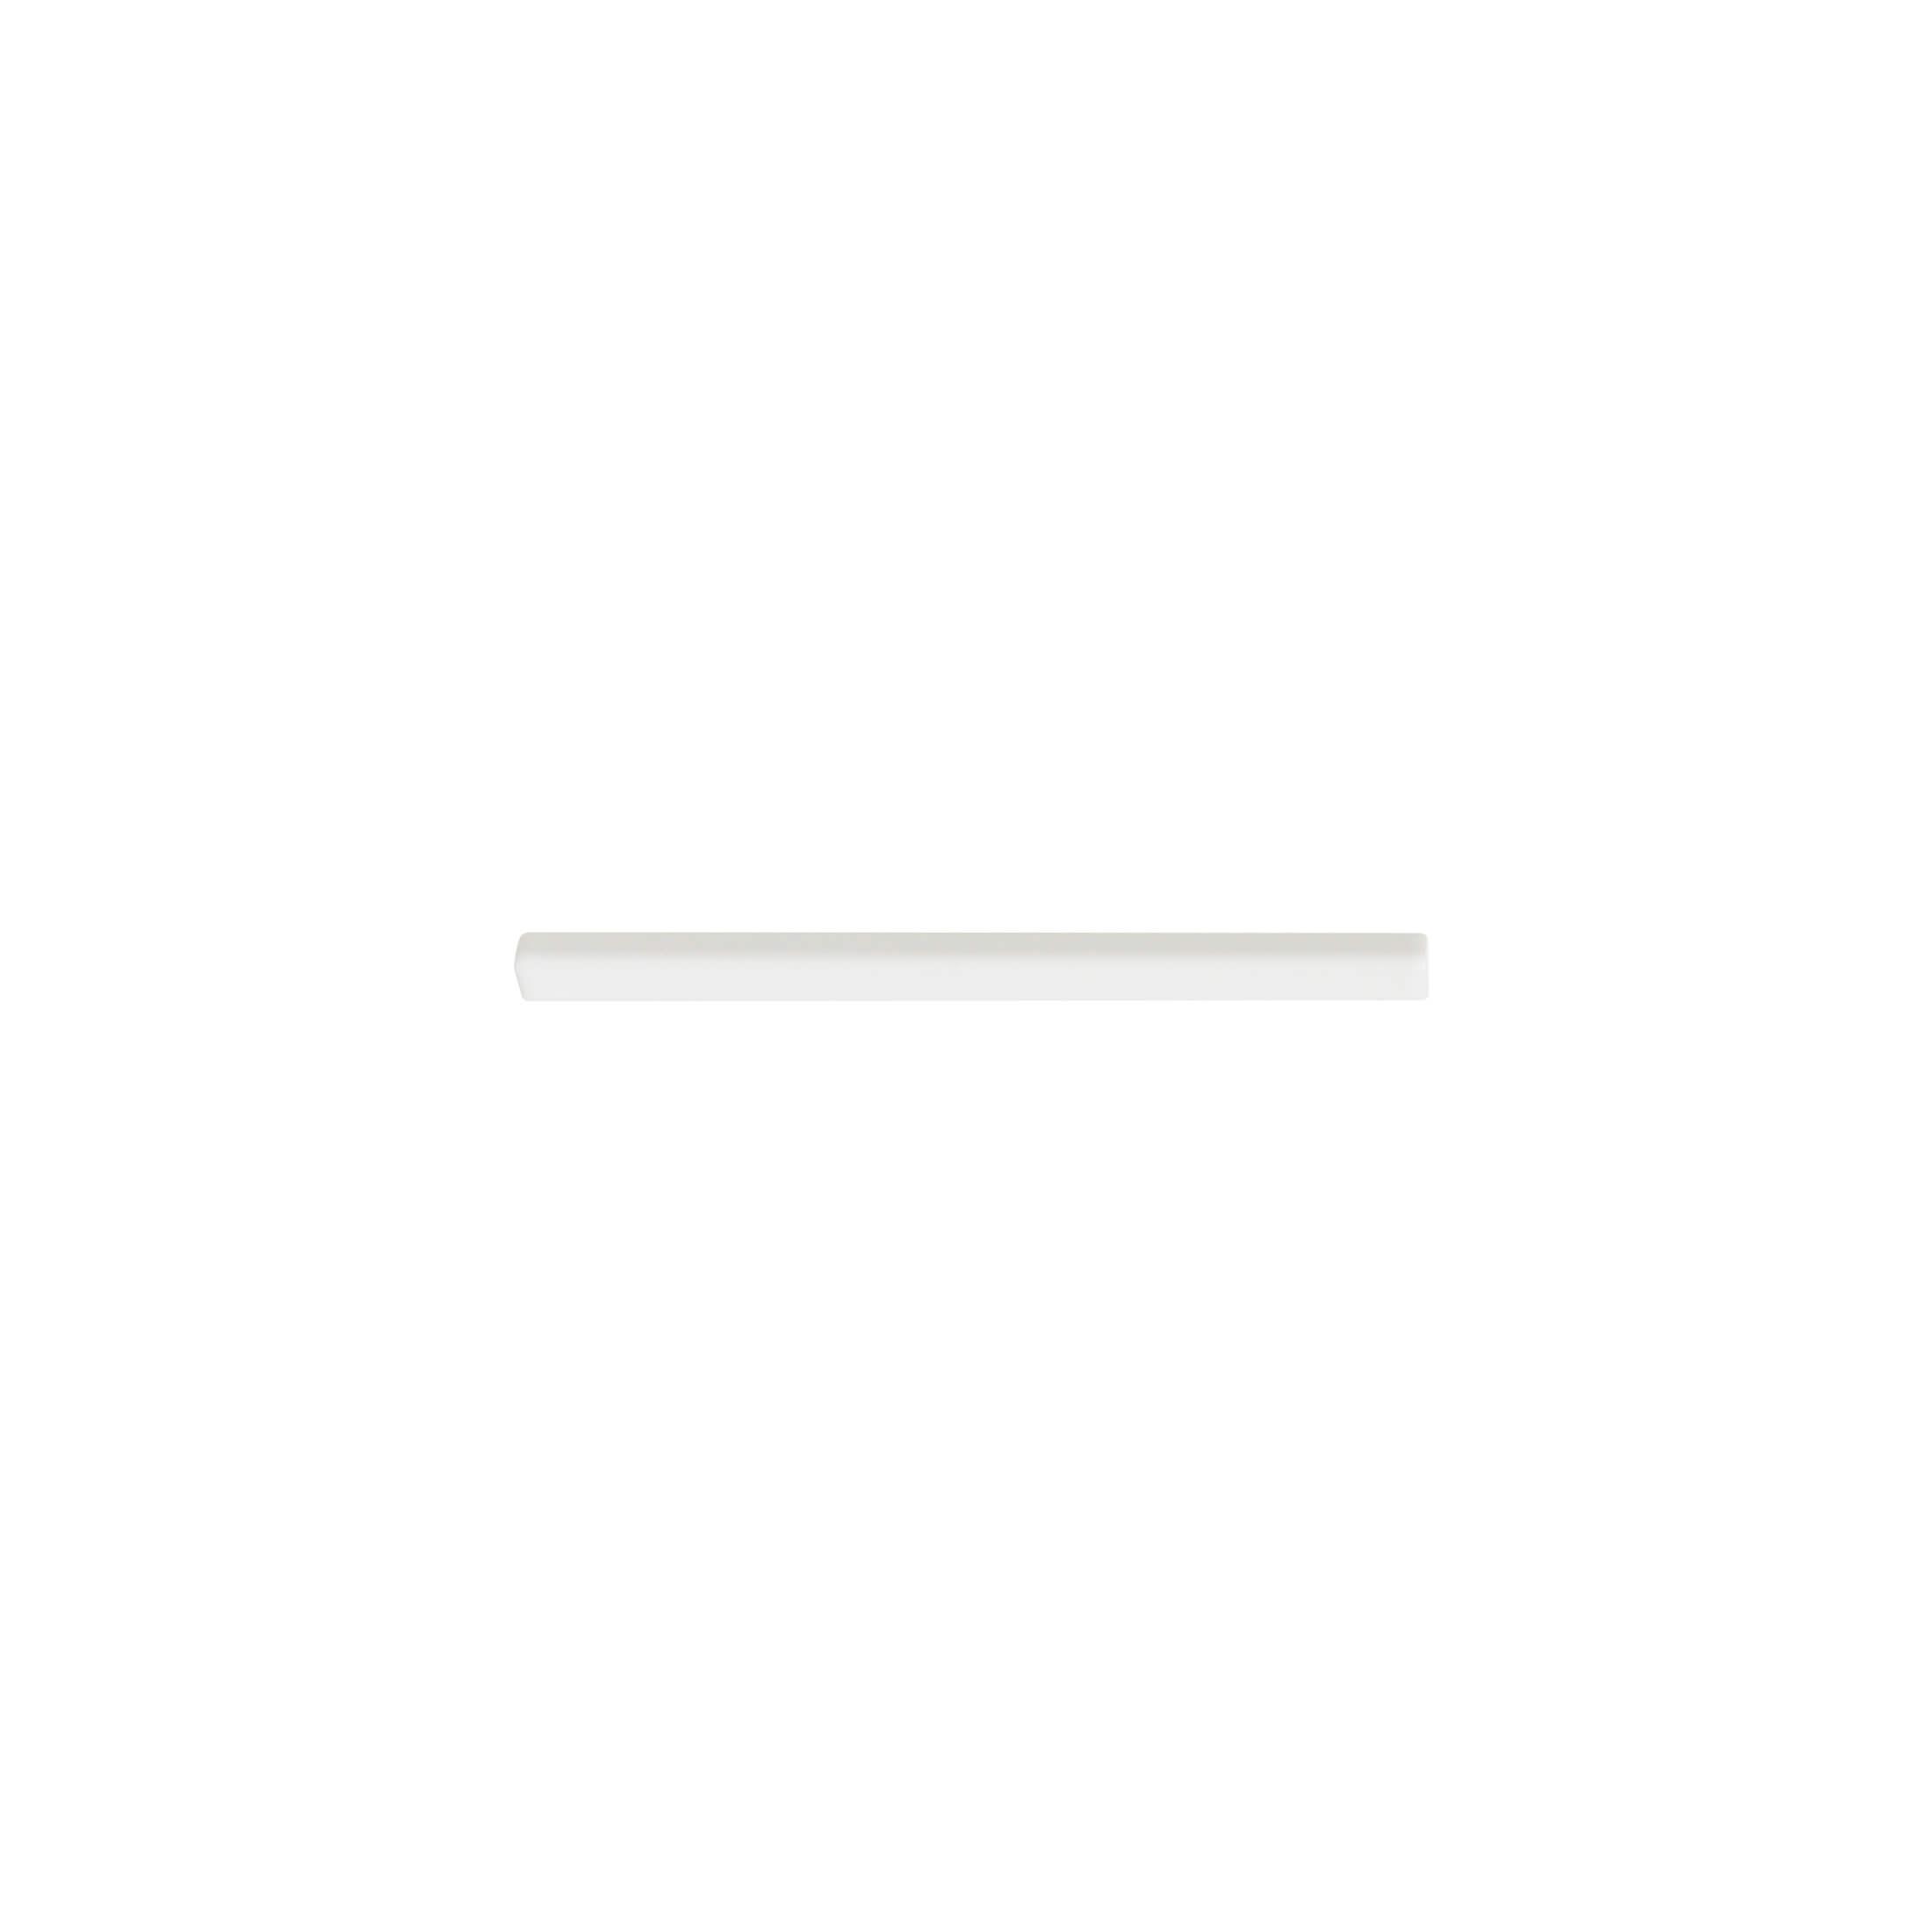 ADNE5574 - BULLNOSE TRIM - 0.85 cm X 15 cm